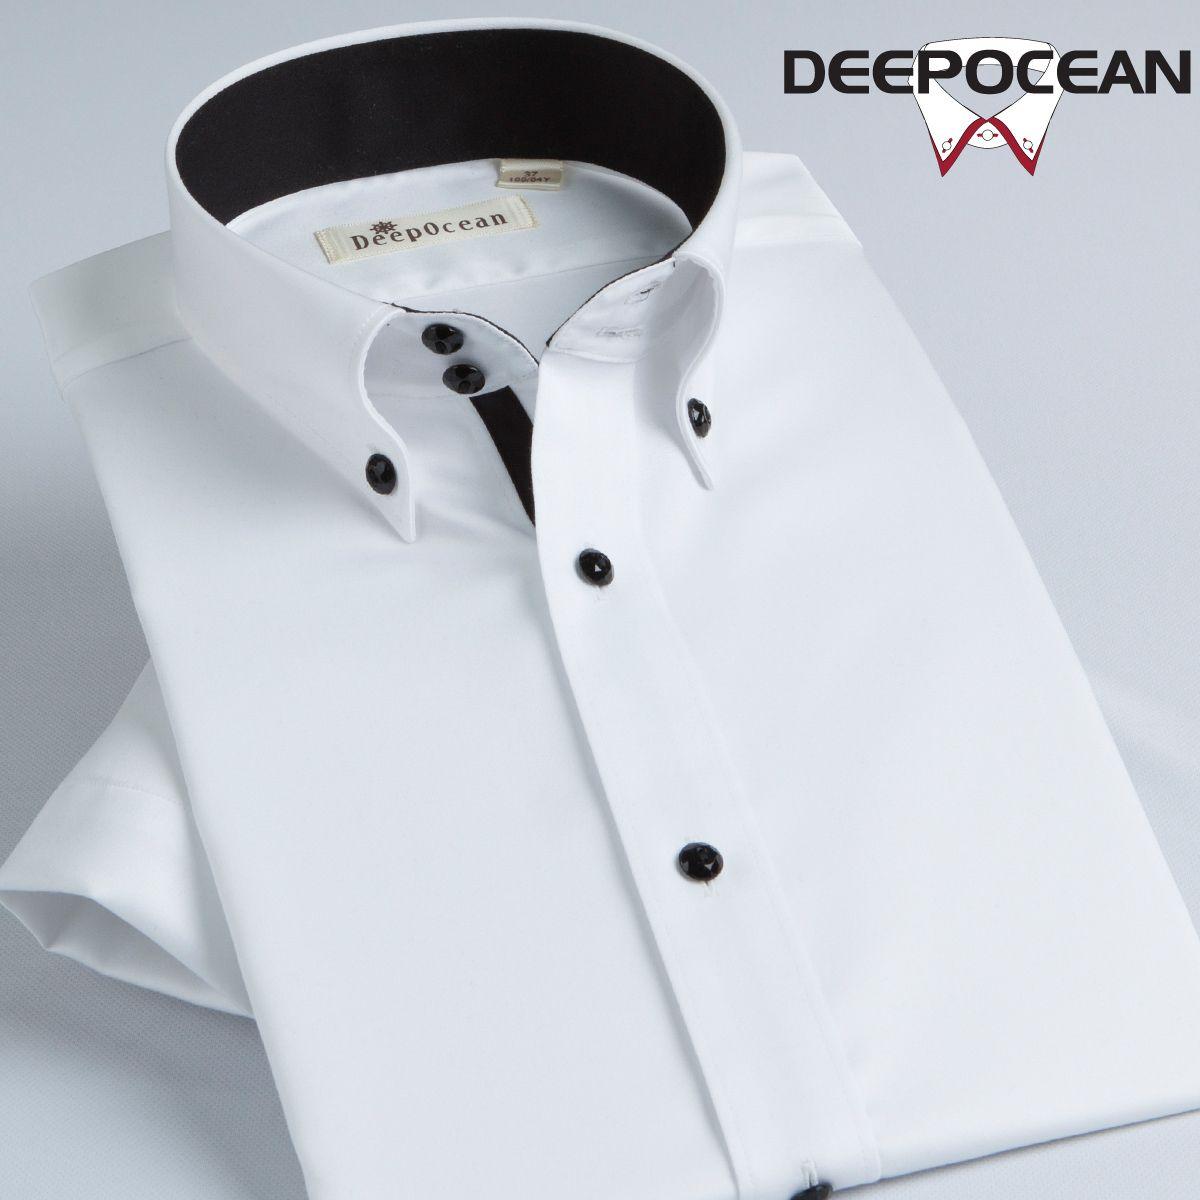 deepocean shirts - Αναζήτηση Google | SHIRTS | Pinterest | Google